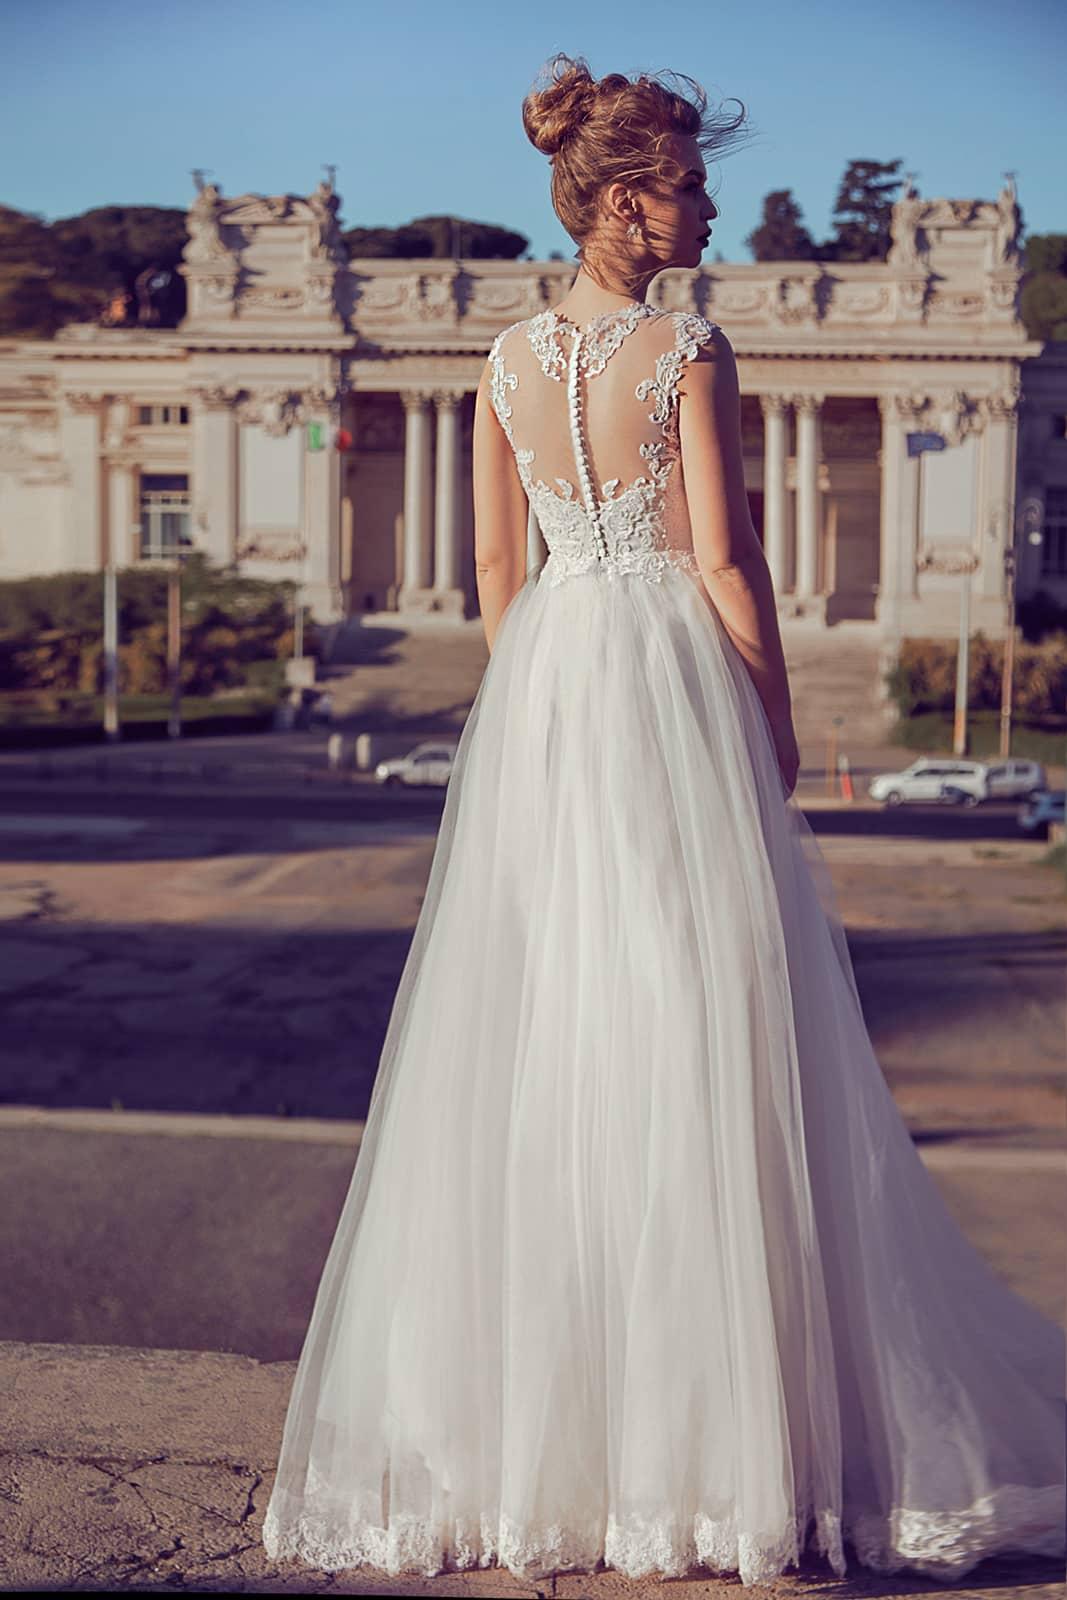 Natalie Model - Colectia Roma - Adora Sposa (2)